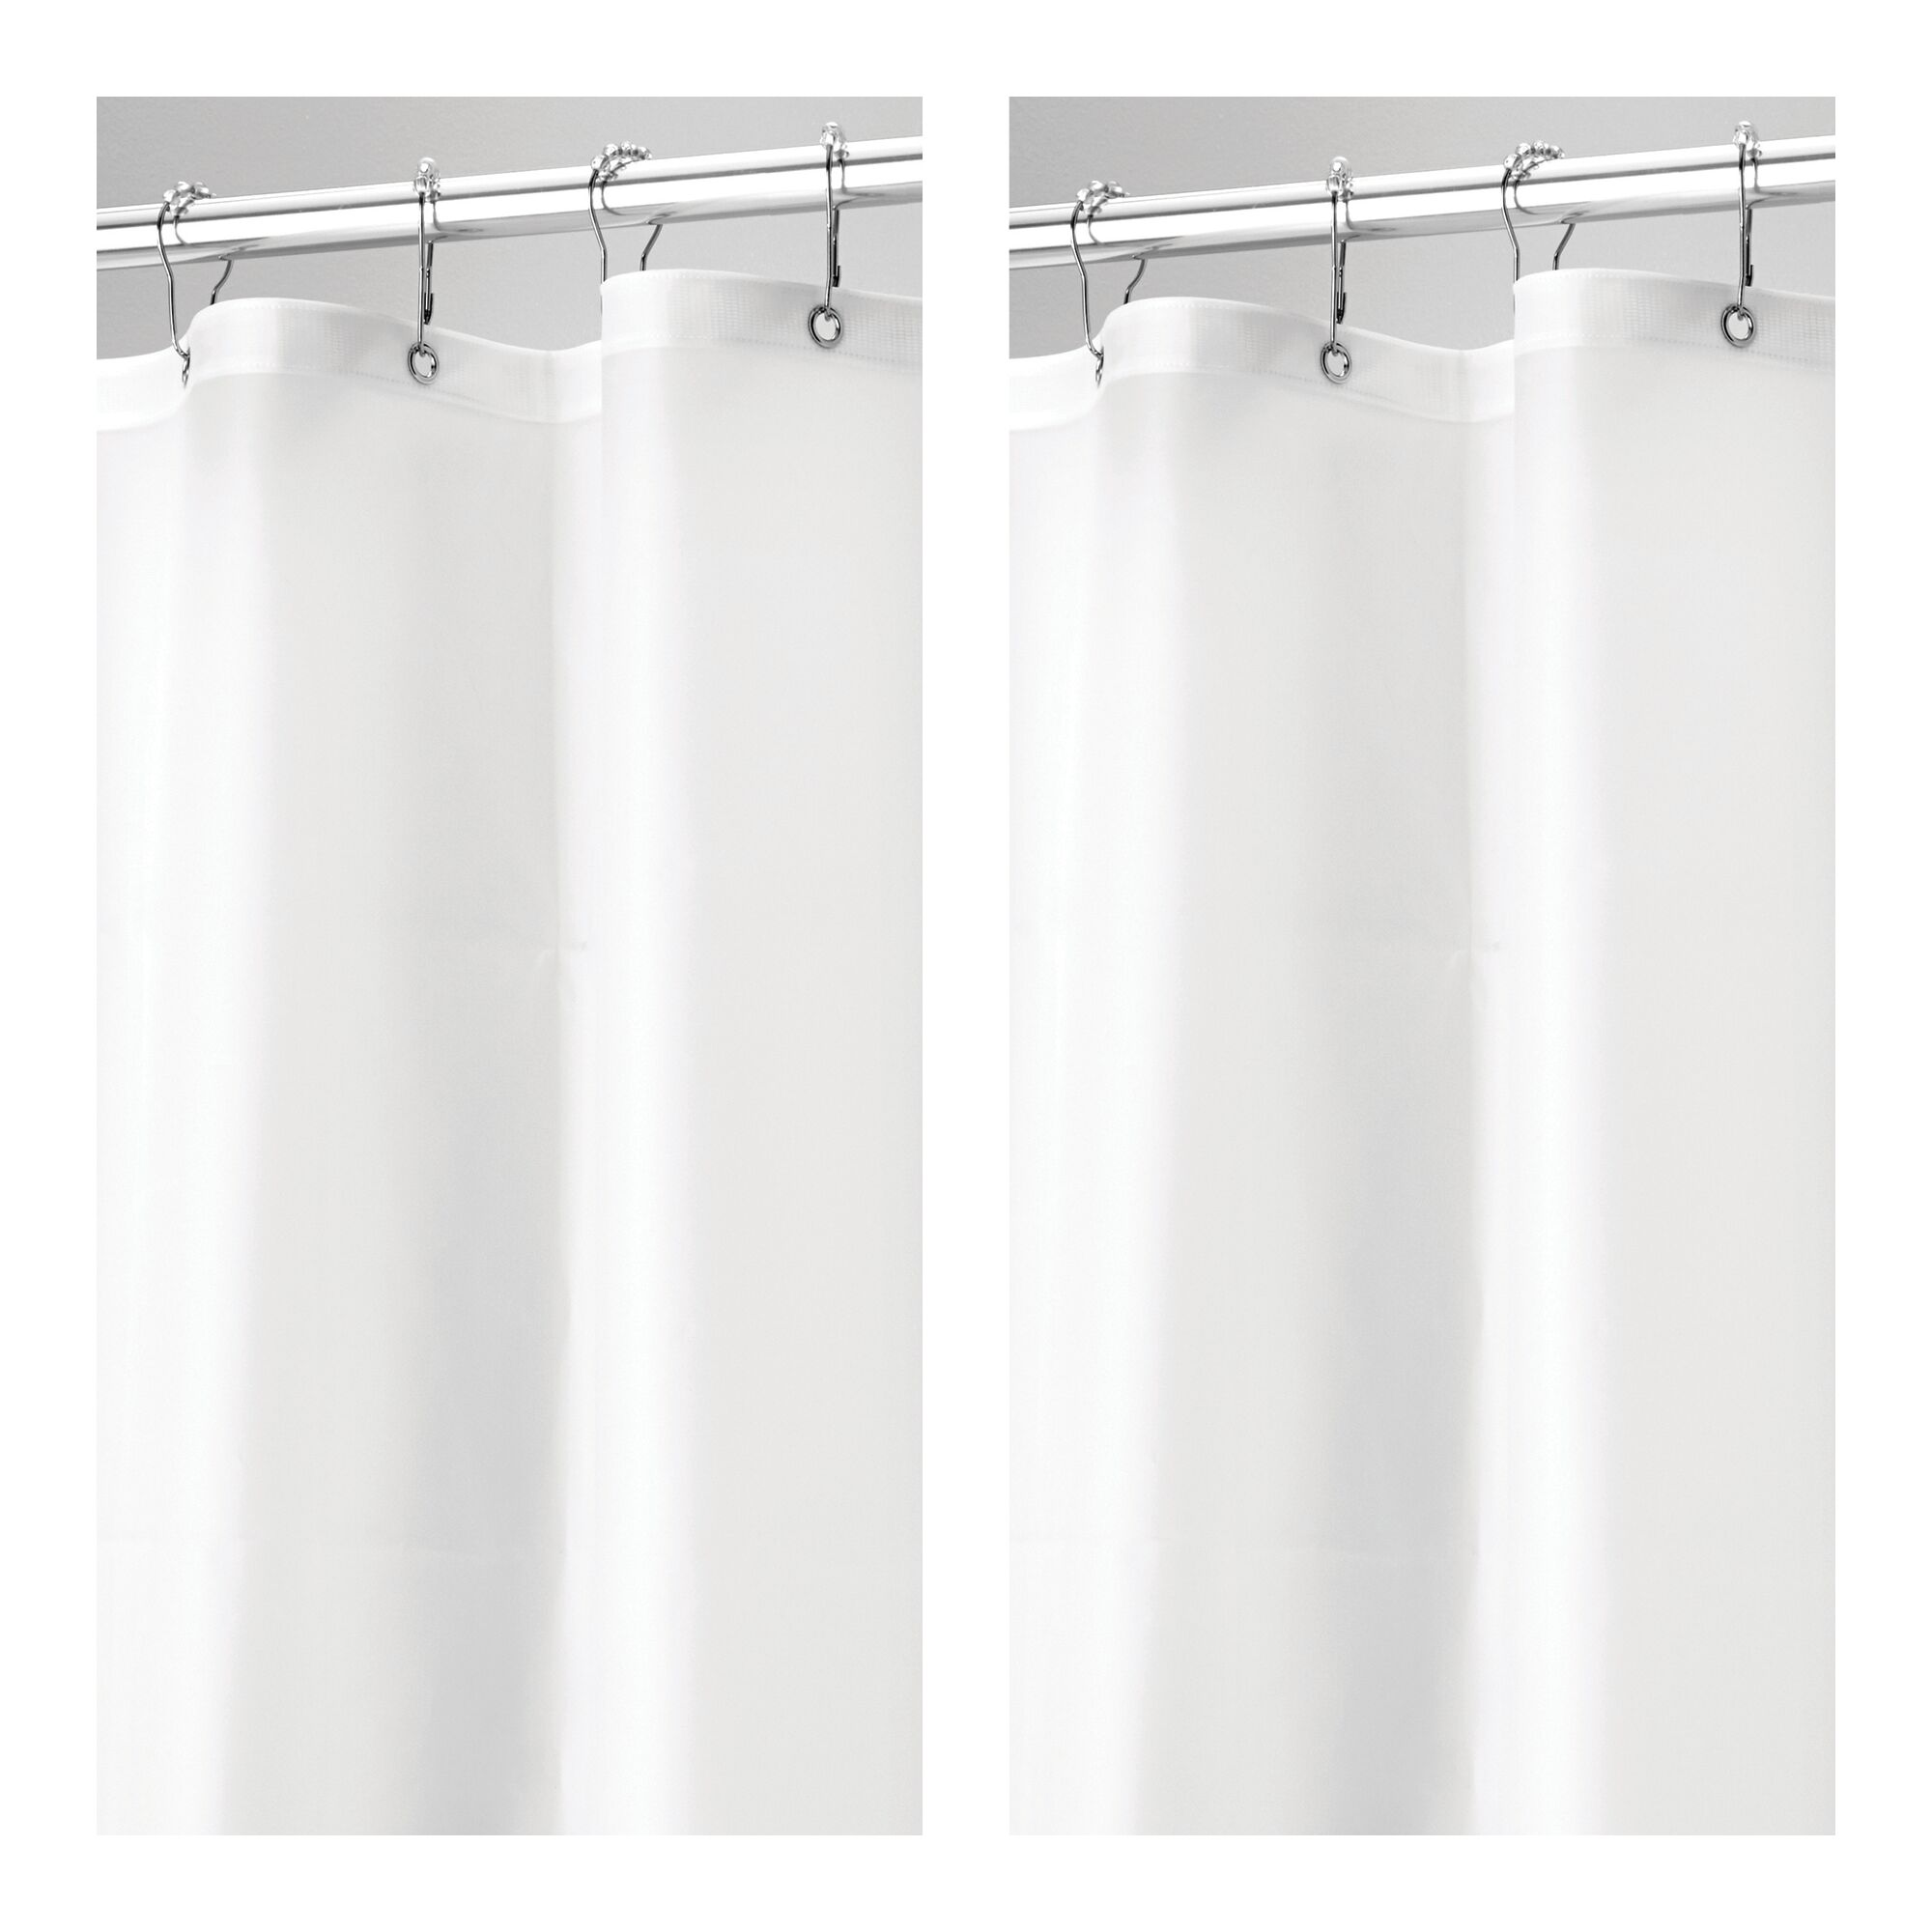 mDesign-Premium-Waterproof-Vinyl-Shower-Curtain-Liner-72-034-x-72-034 miniatuur 30